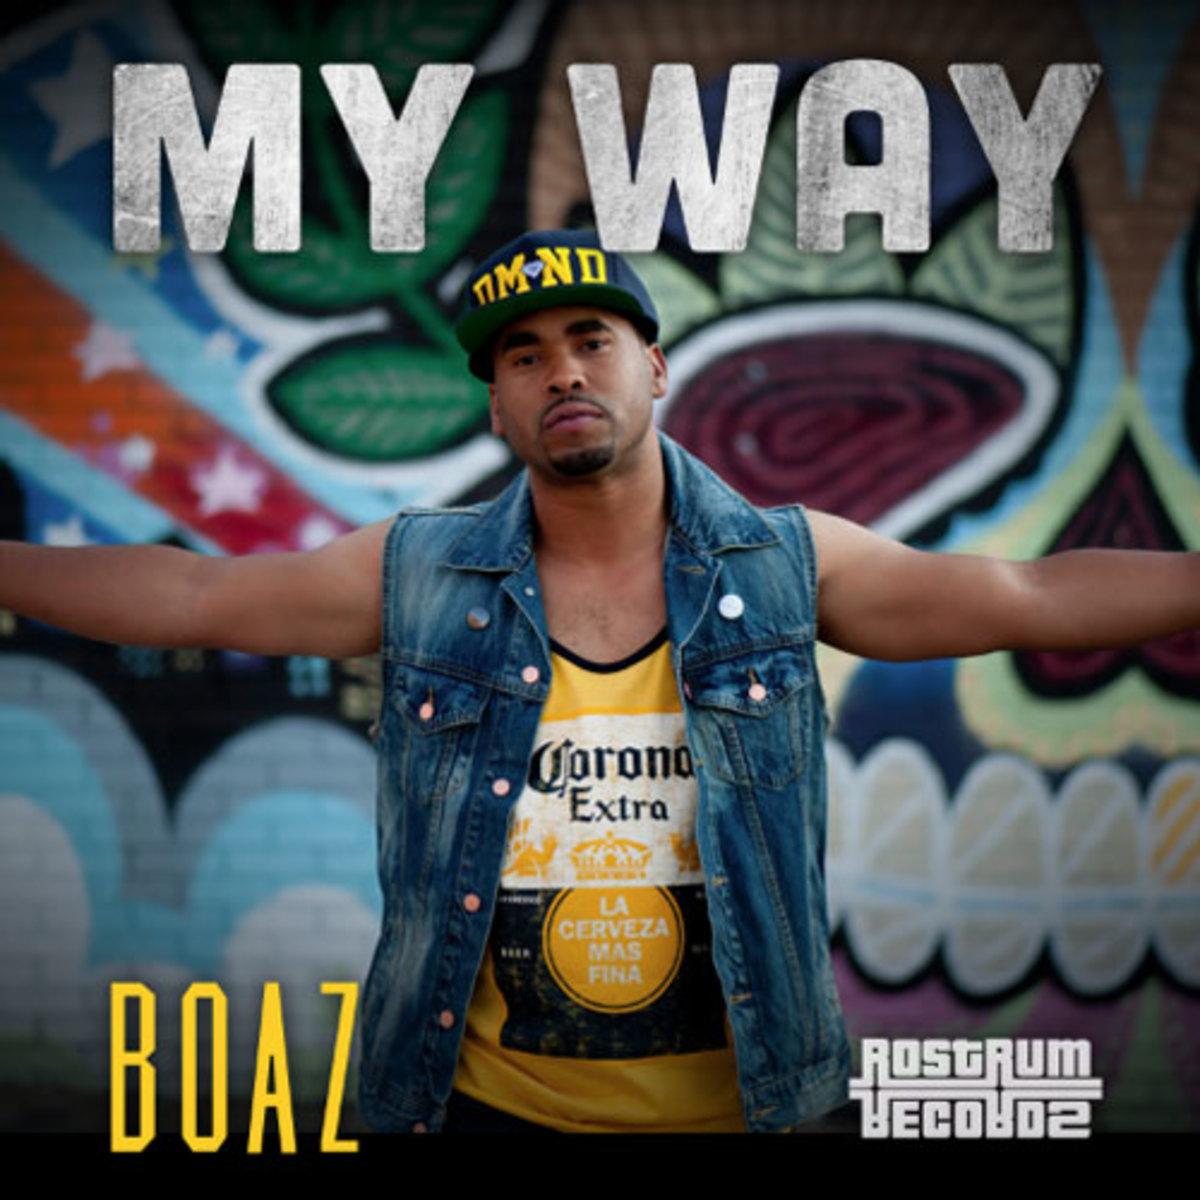 boaz-myway.jpg